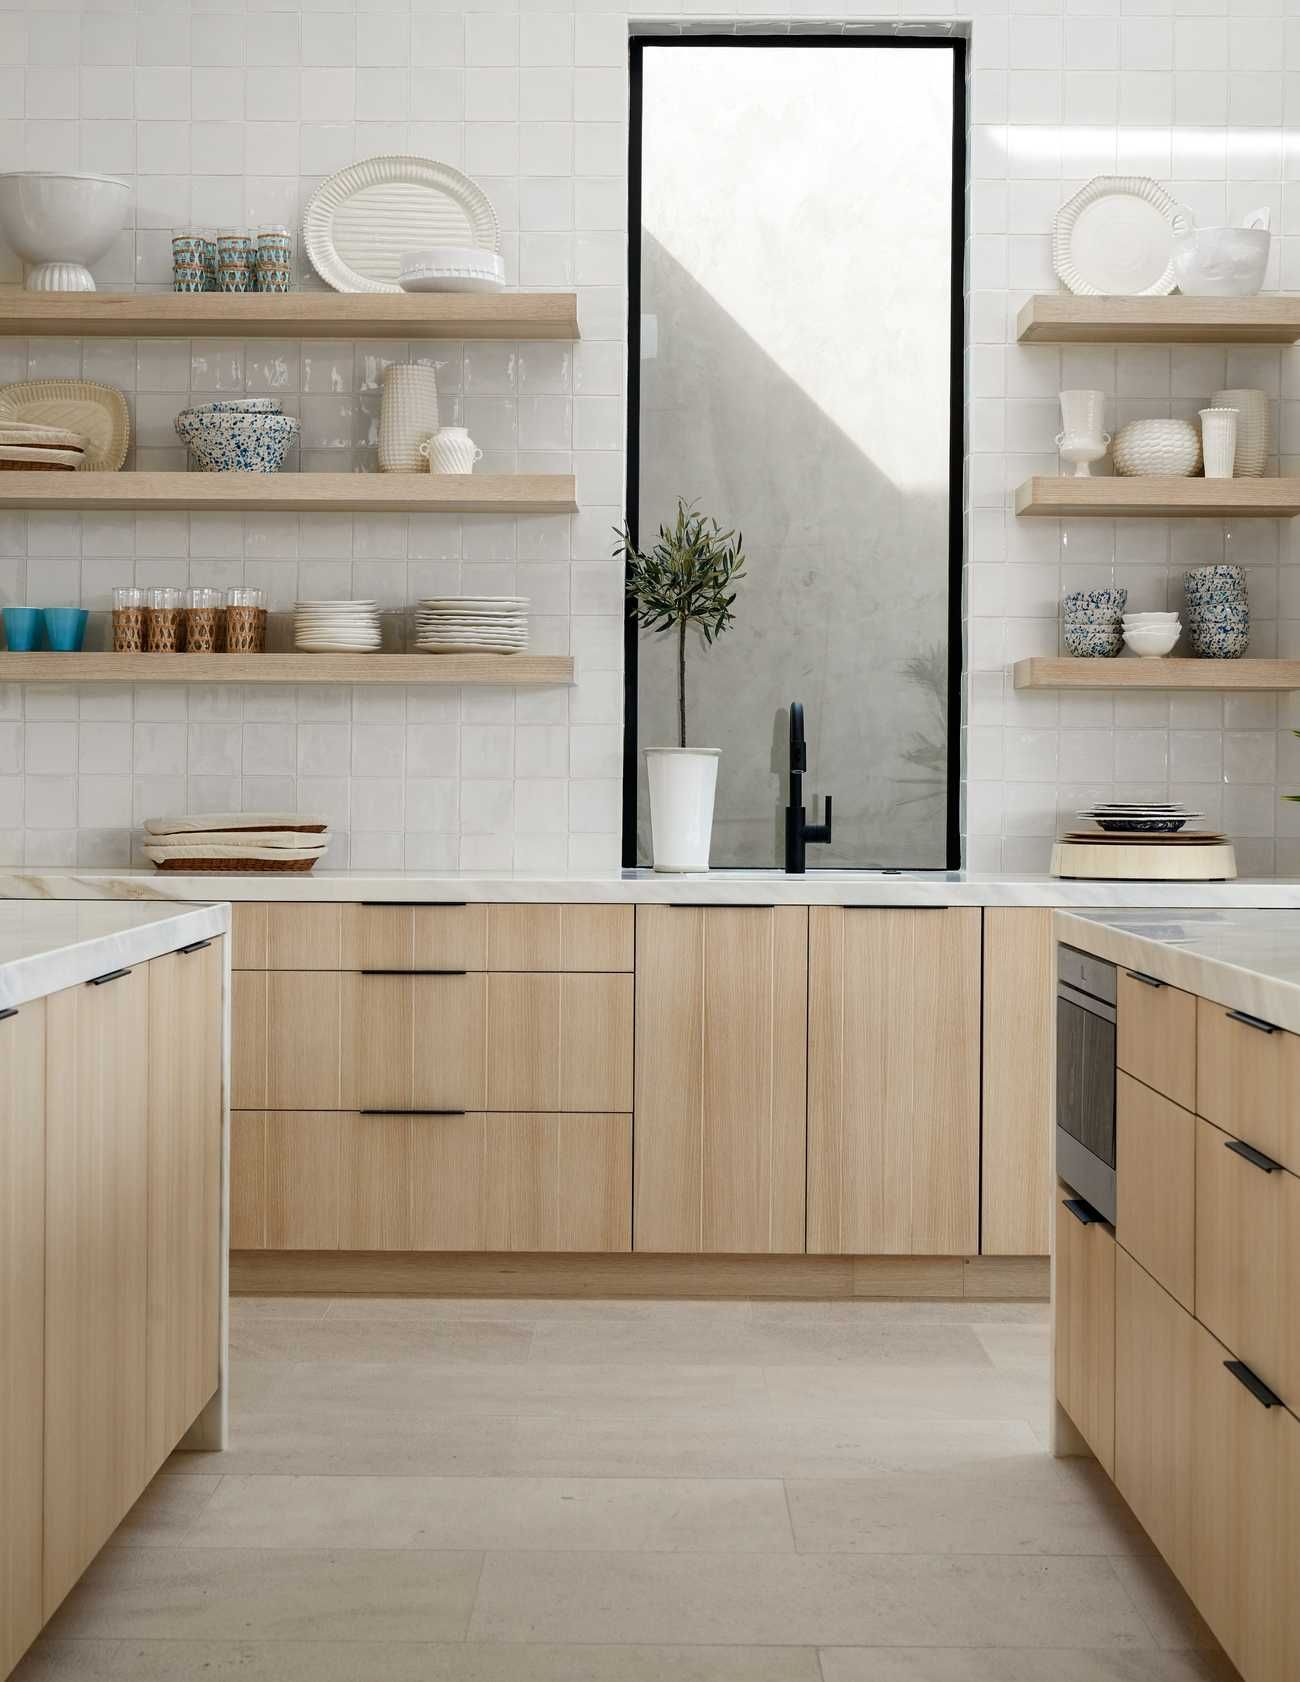 casa leggera part a... the great room and kitchen - Hillary Taylor Interiors